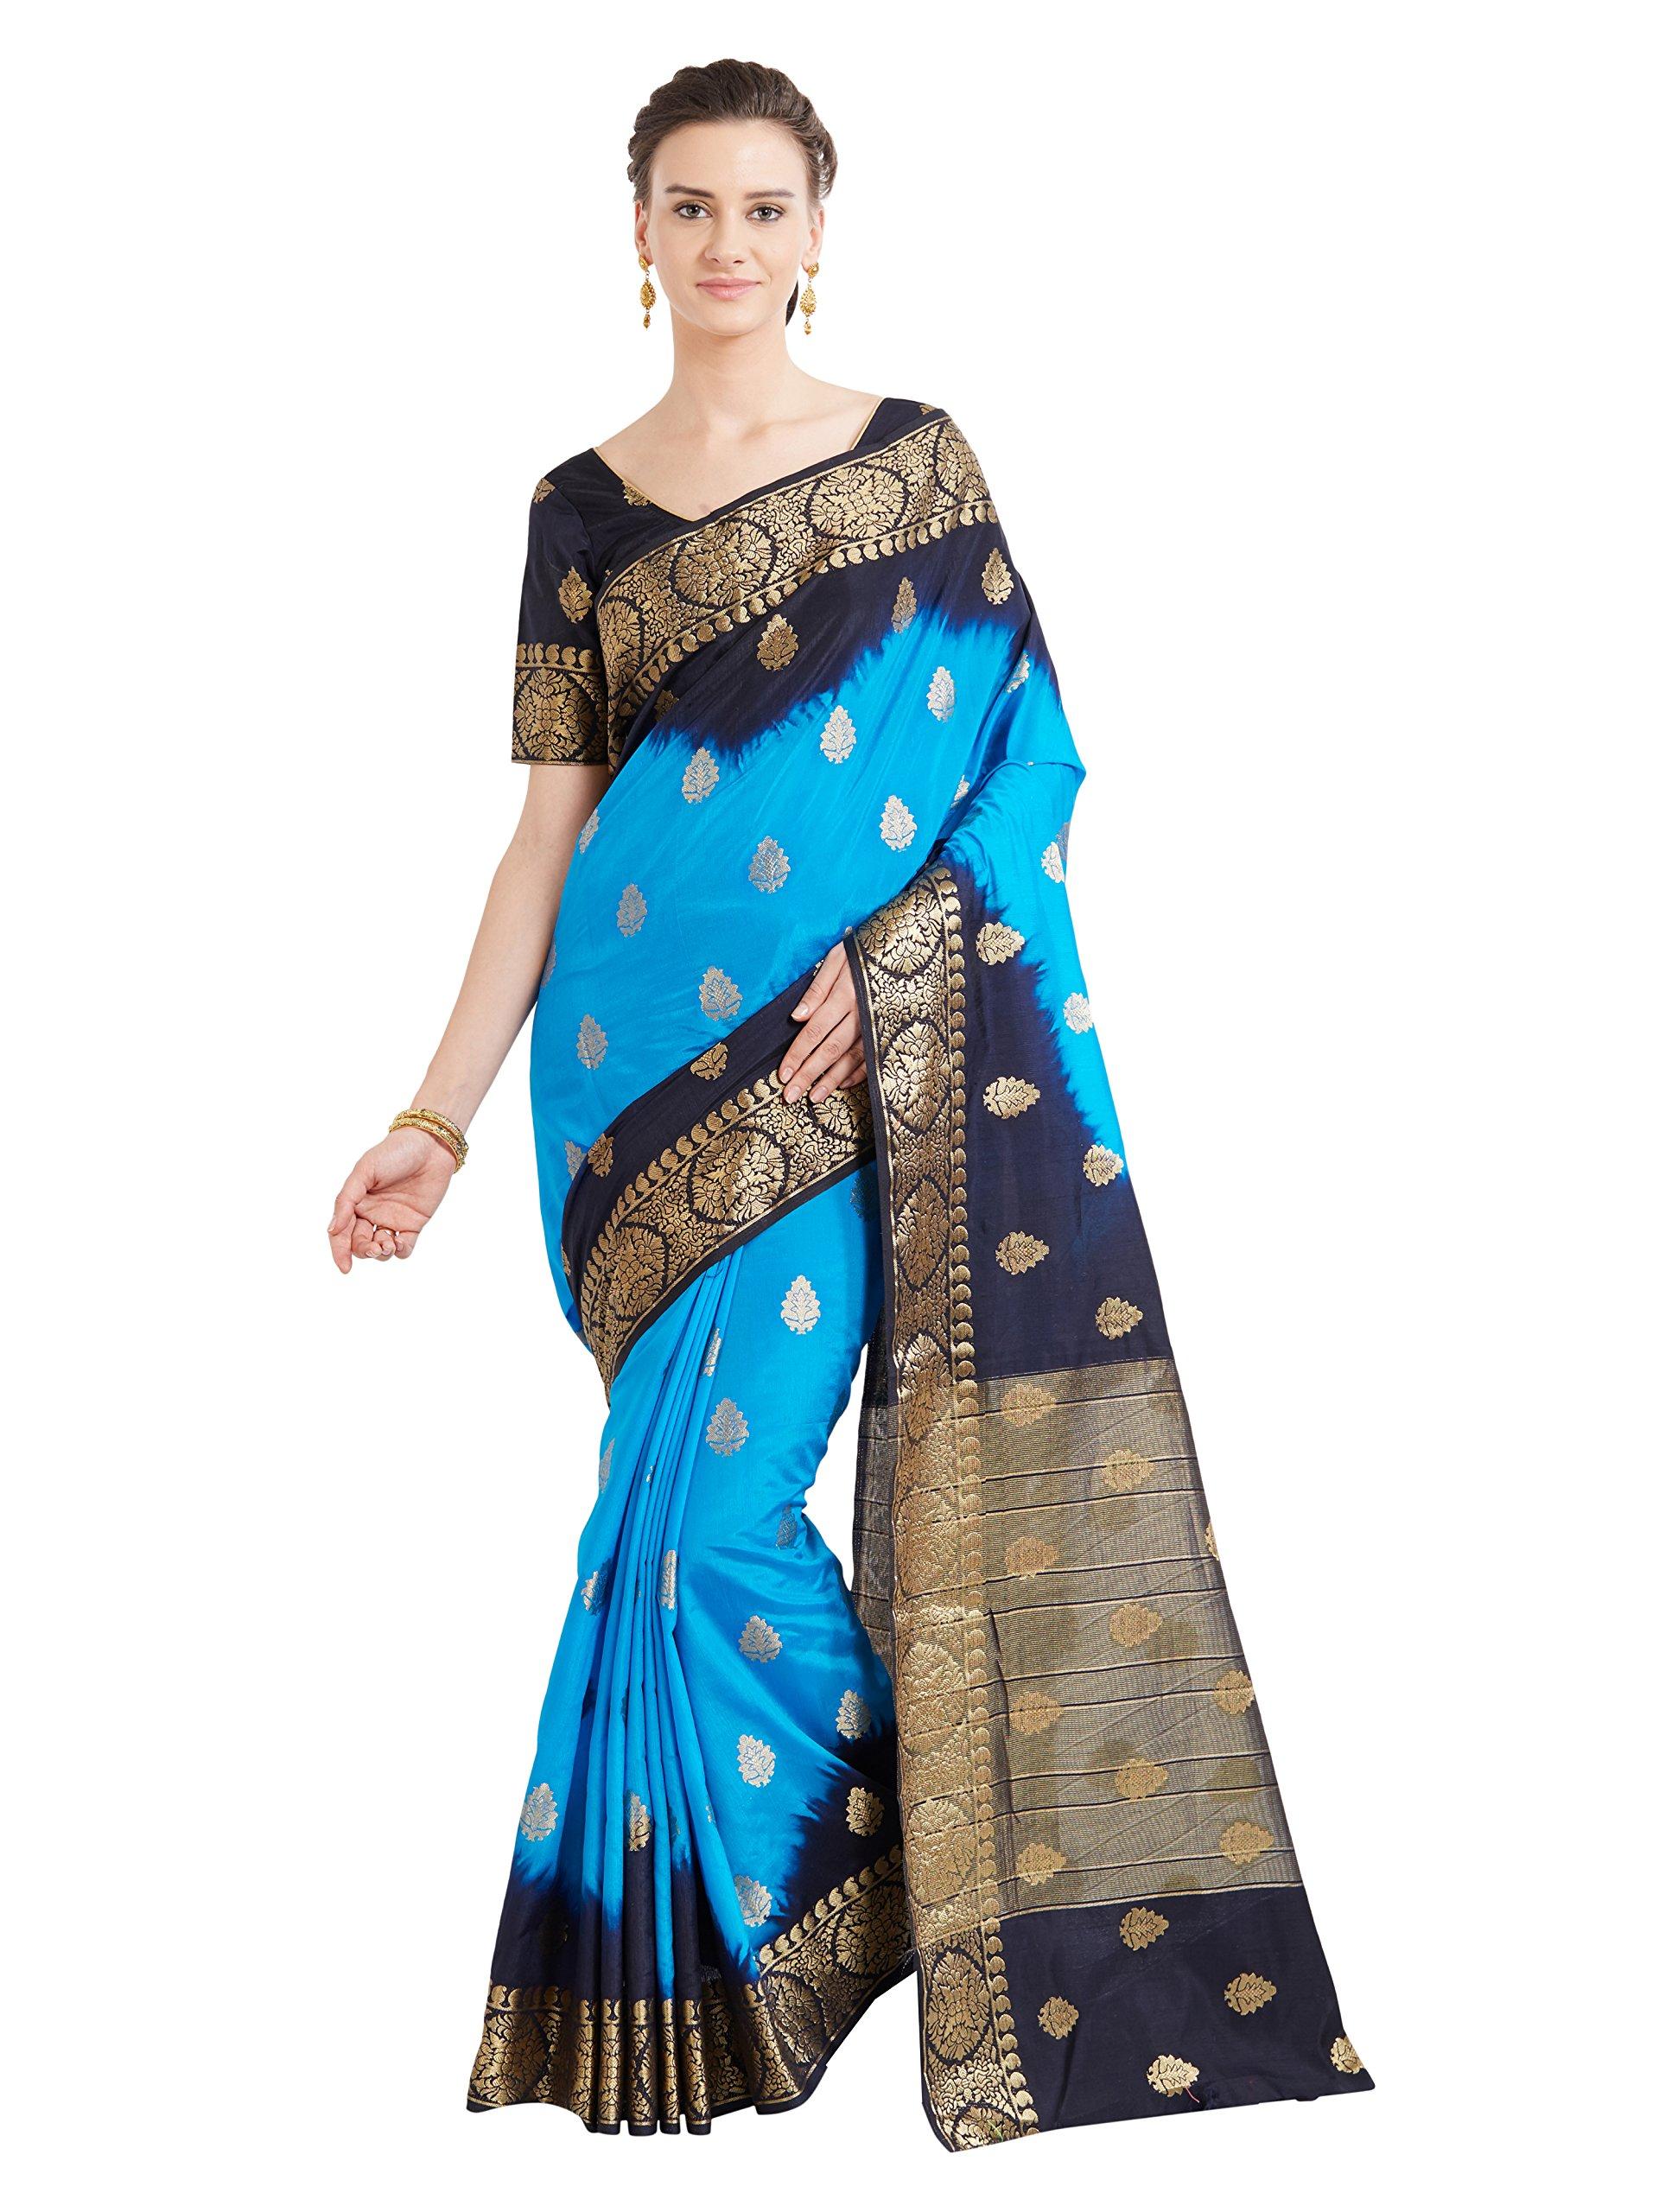 Viva N Diva Sarees for Women's Banarasi Latest Design Party Wear Shaded Blue Colour Banarasi Art Silk Saree with Un-Stiched Blouse Piece,Free Size